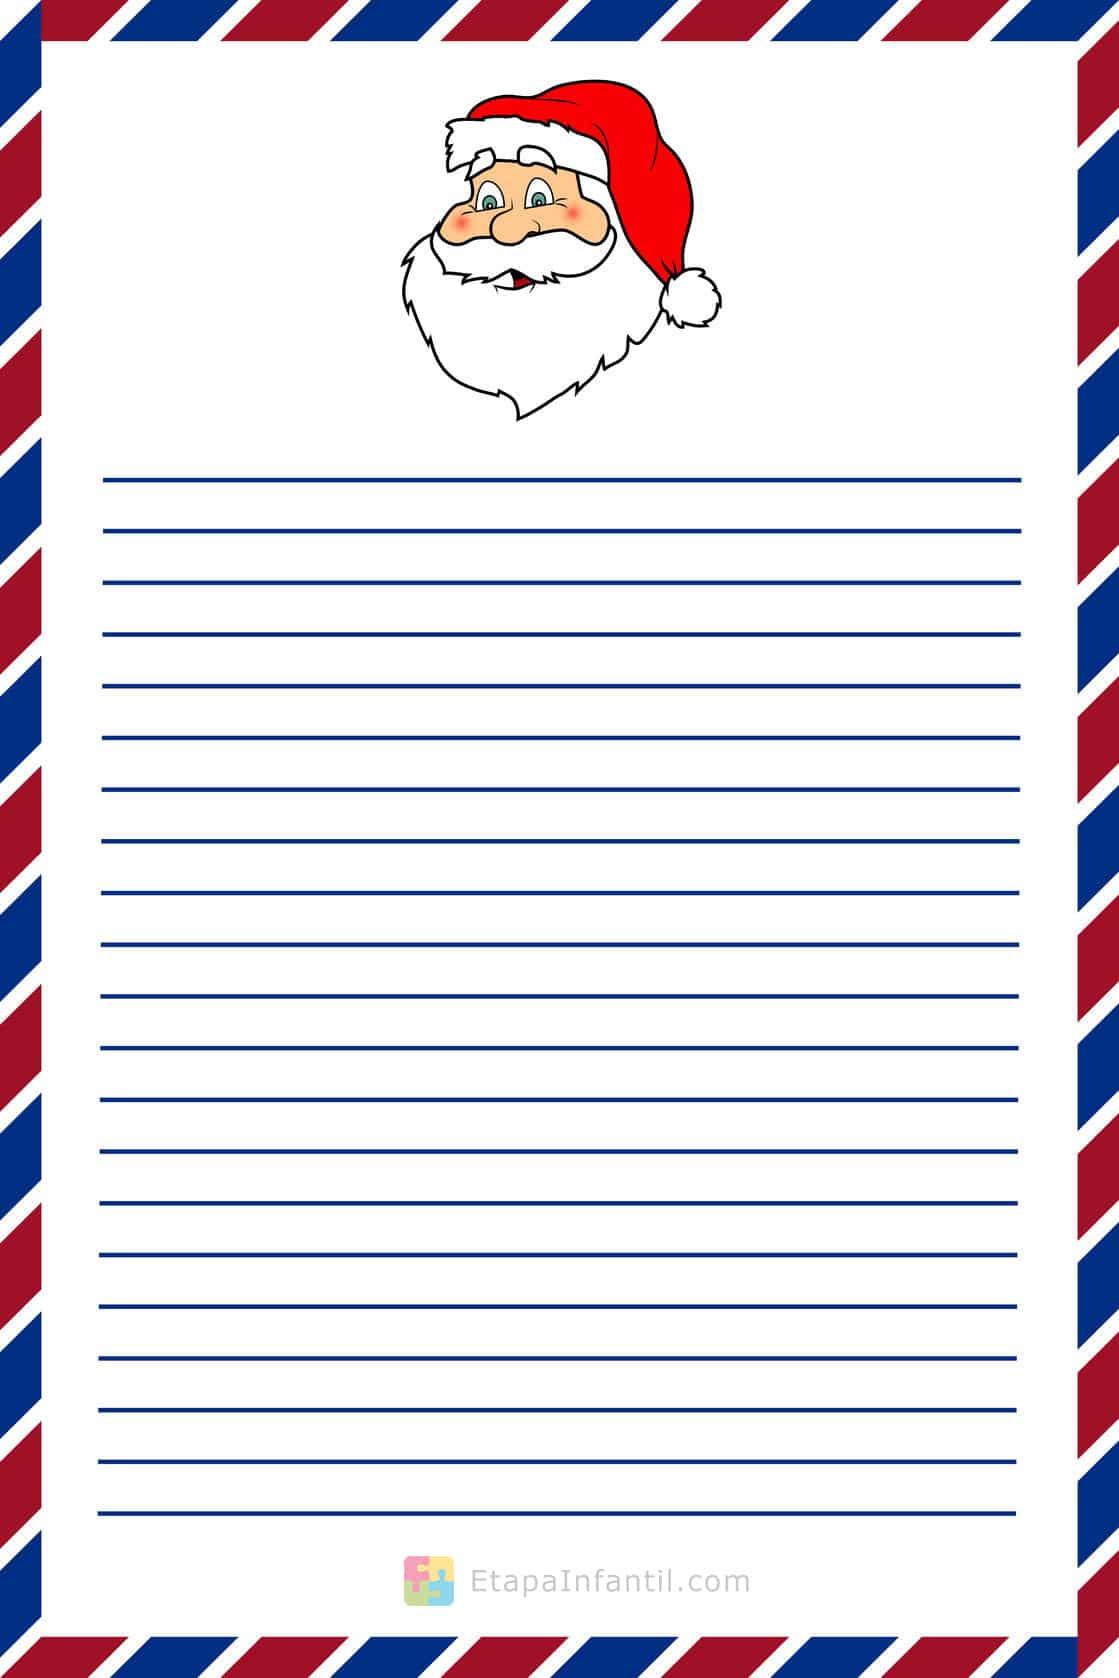 Carta a Papá Noel para imprimir - Etapa Infantil